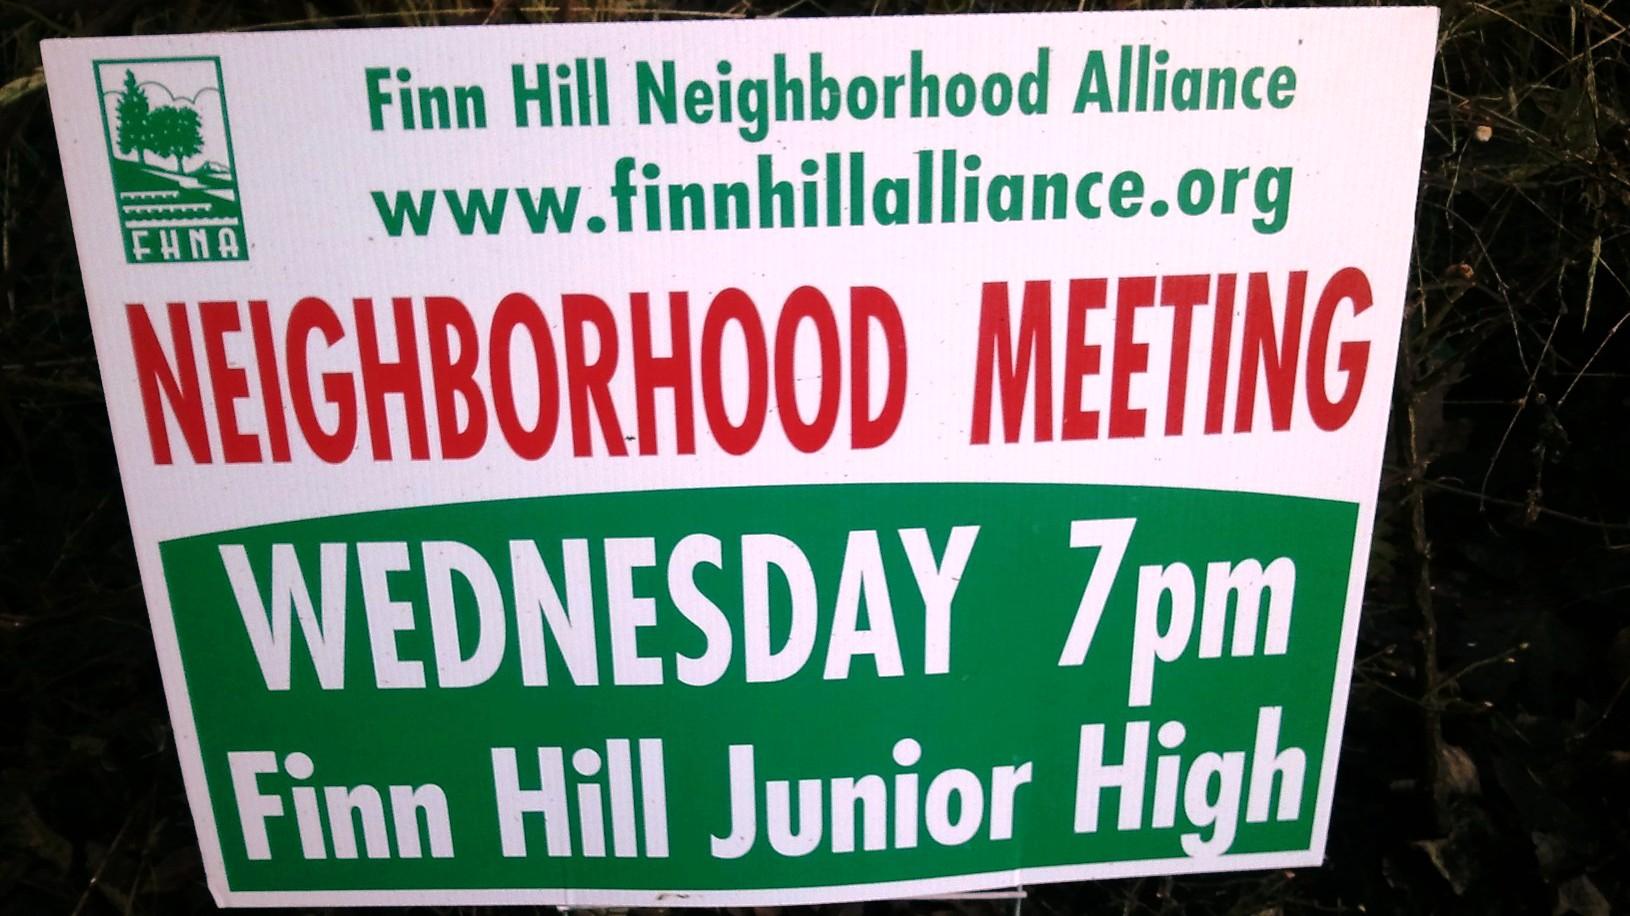 FHNA Neighborhood Mtg Sign